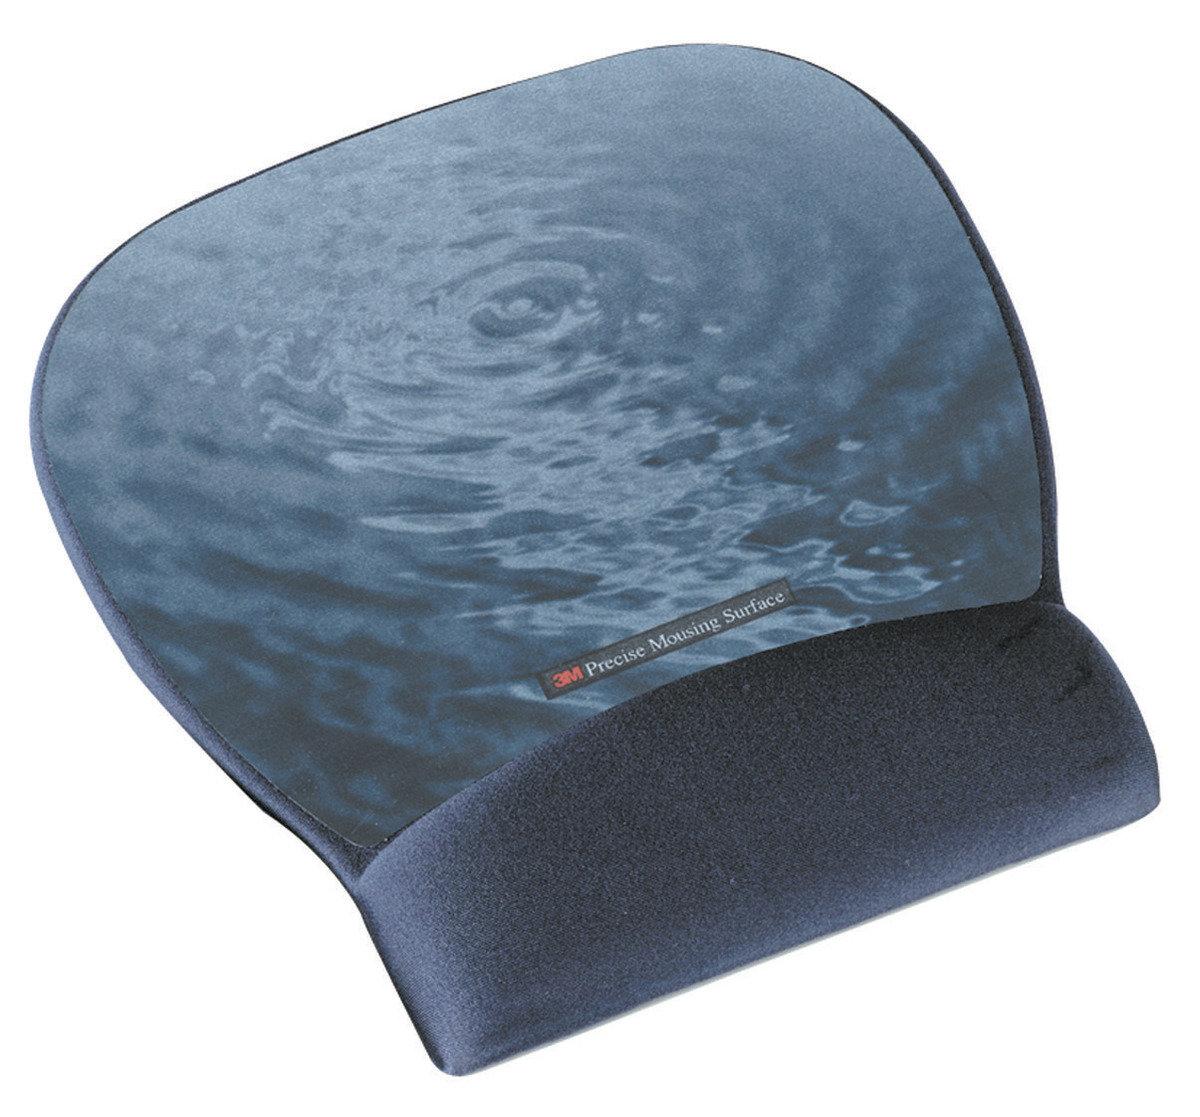 3M™ 穿梭光學滑鼠墊及凝膠腕墊水紋(MW311BE)